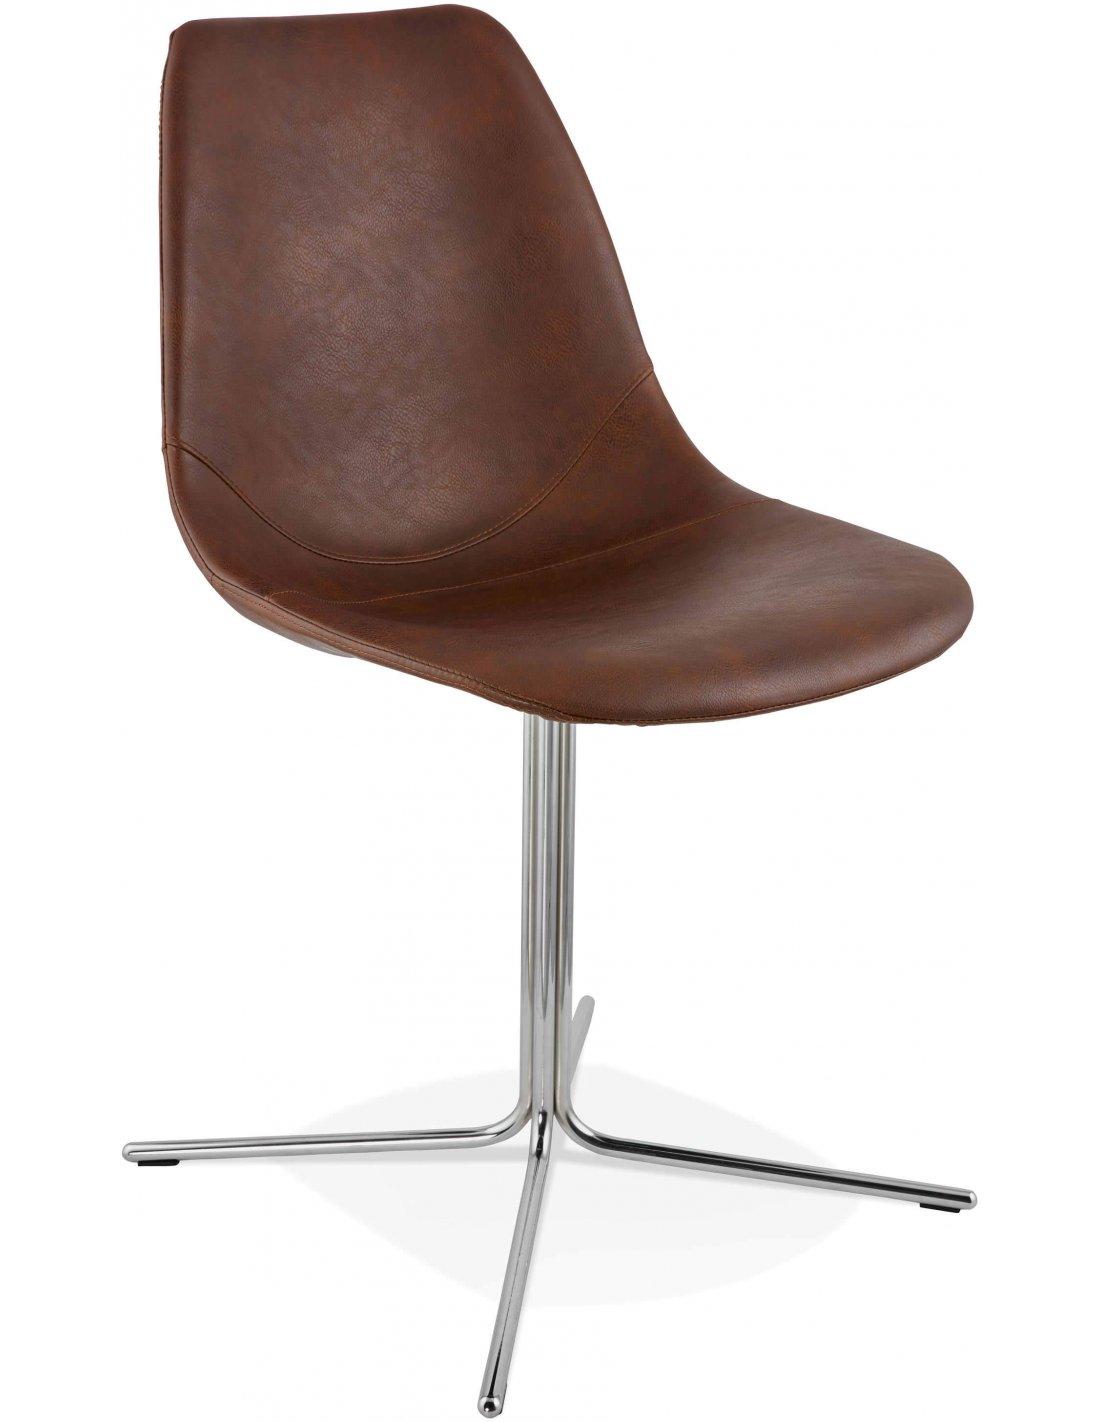 chaise design bedford kokoon design marron